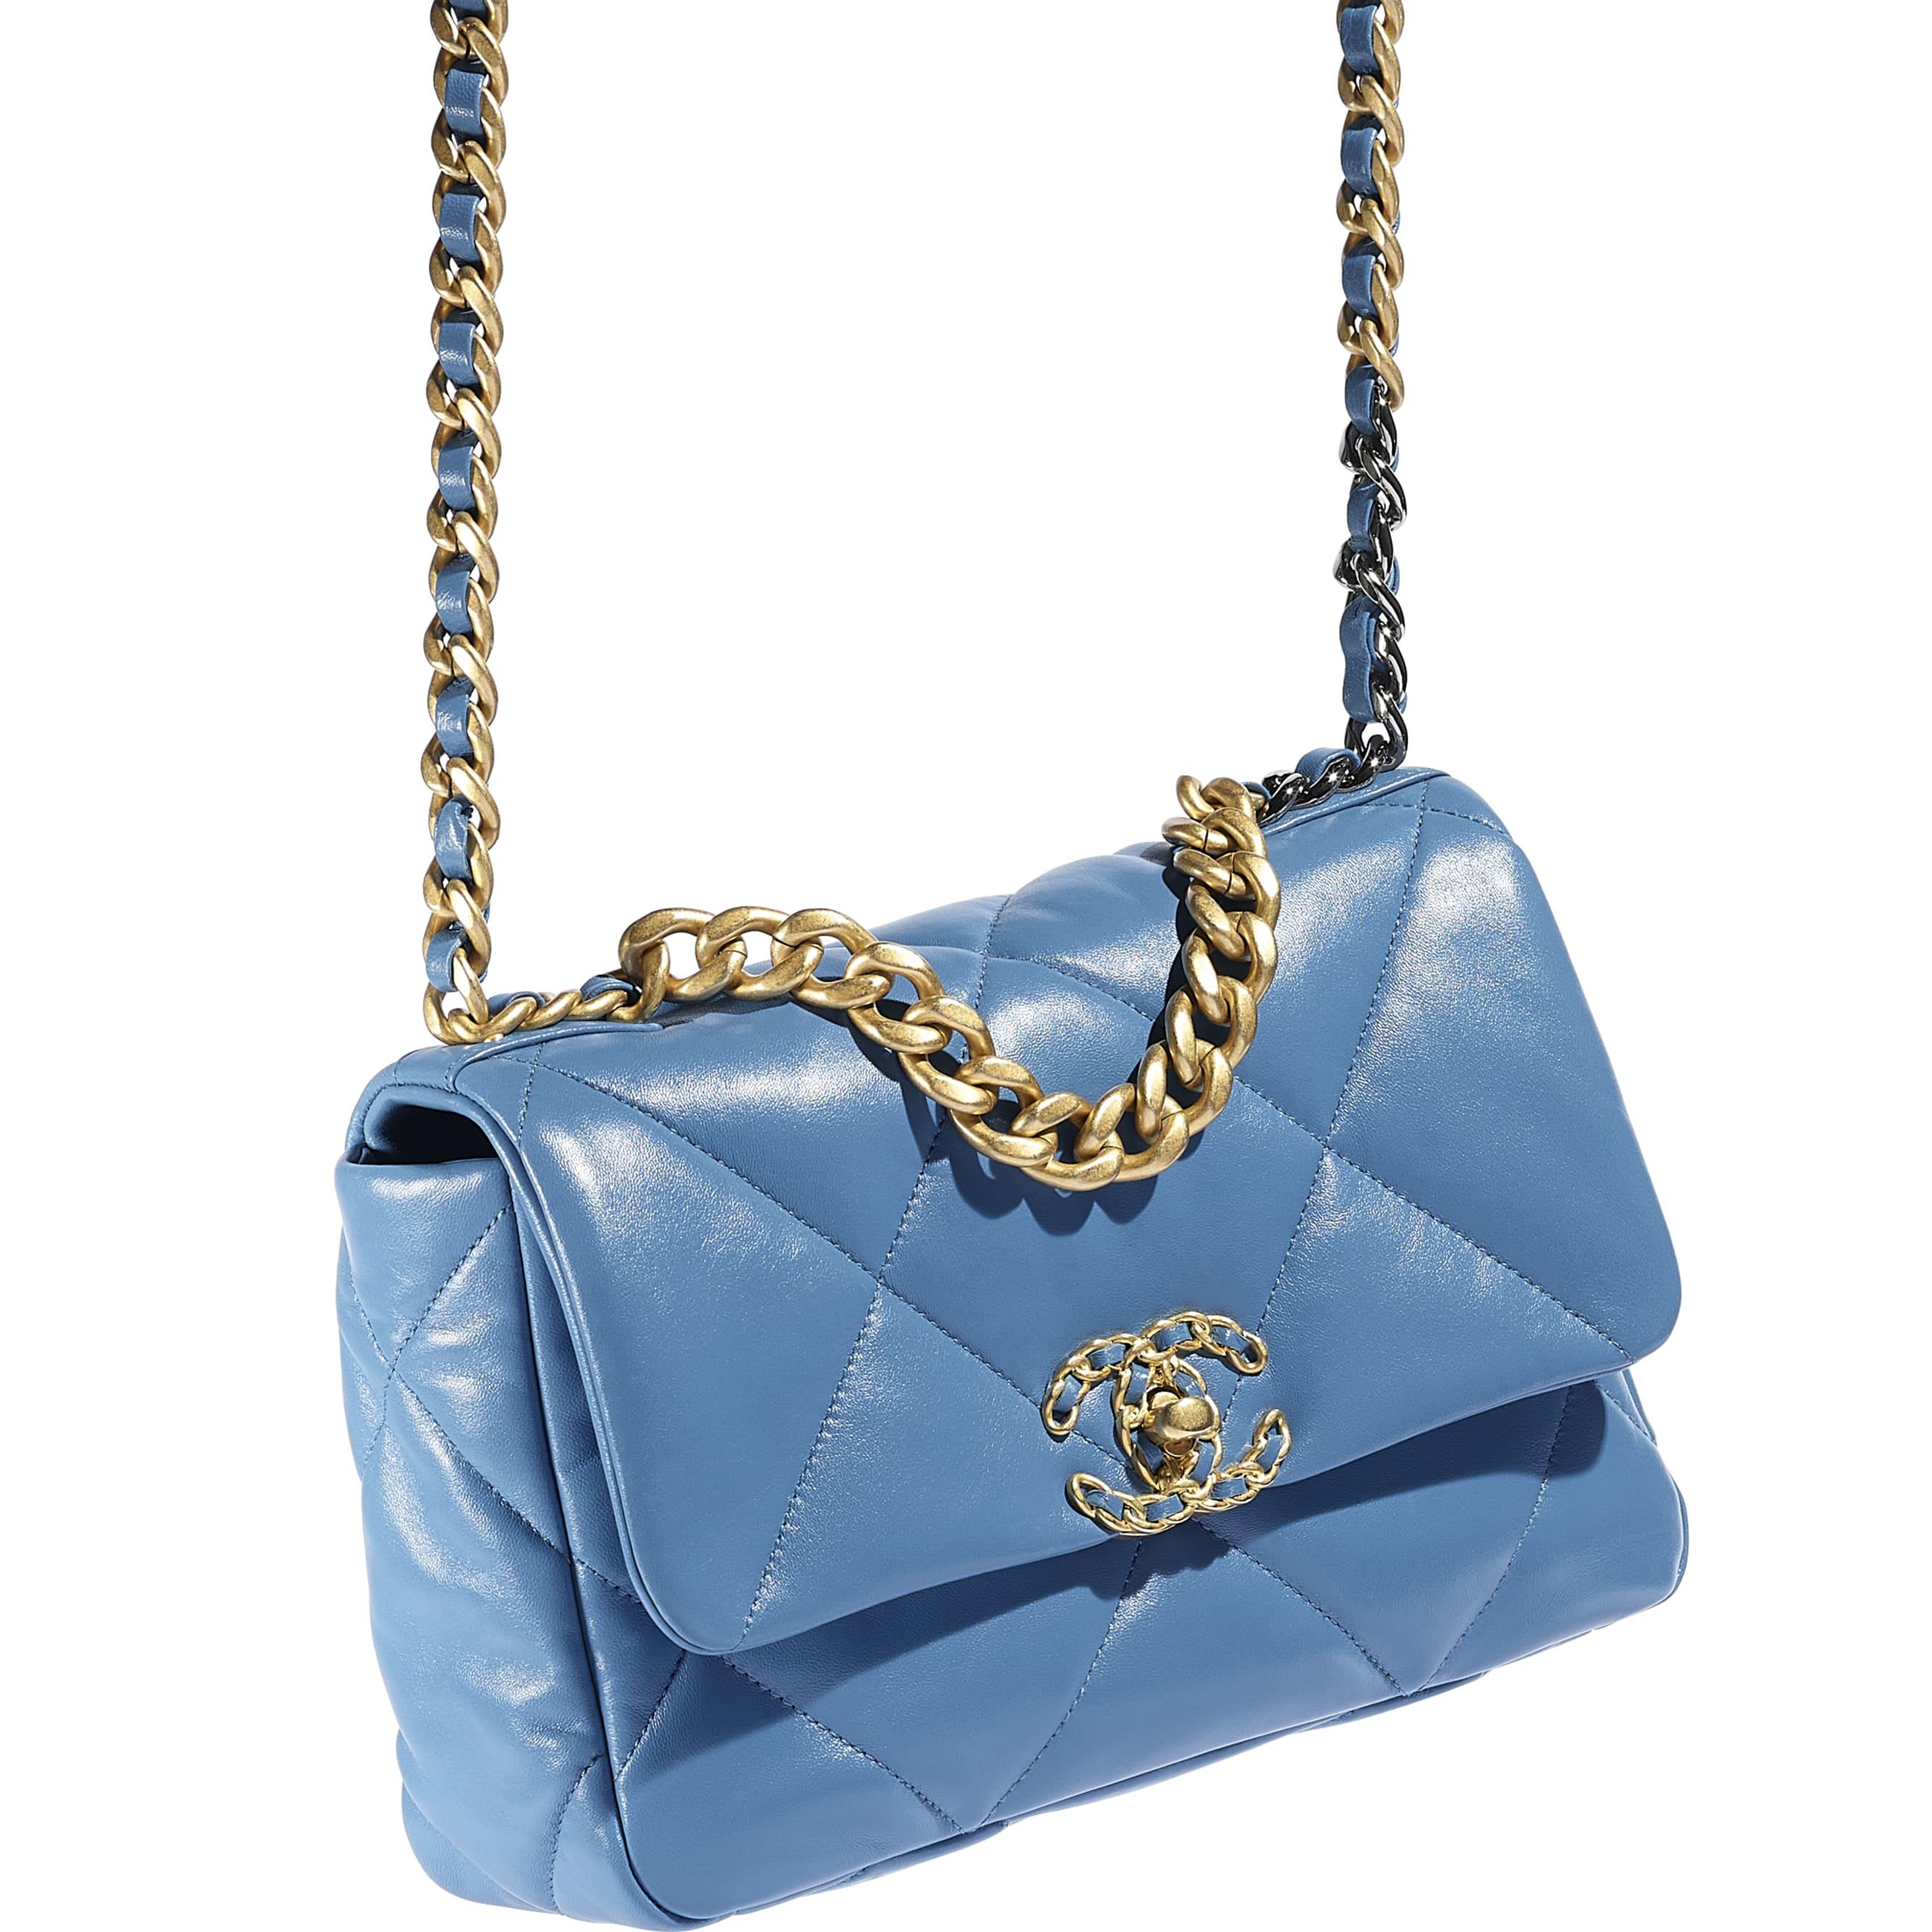 CHANEL 19 Handbag - Blue - Lambskin, Gold-Tone, Silver-Tone & Ruthenium-Finish Metal - CHANEL - Extra view - see standard sized version